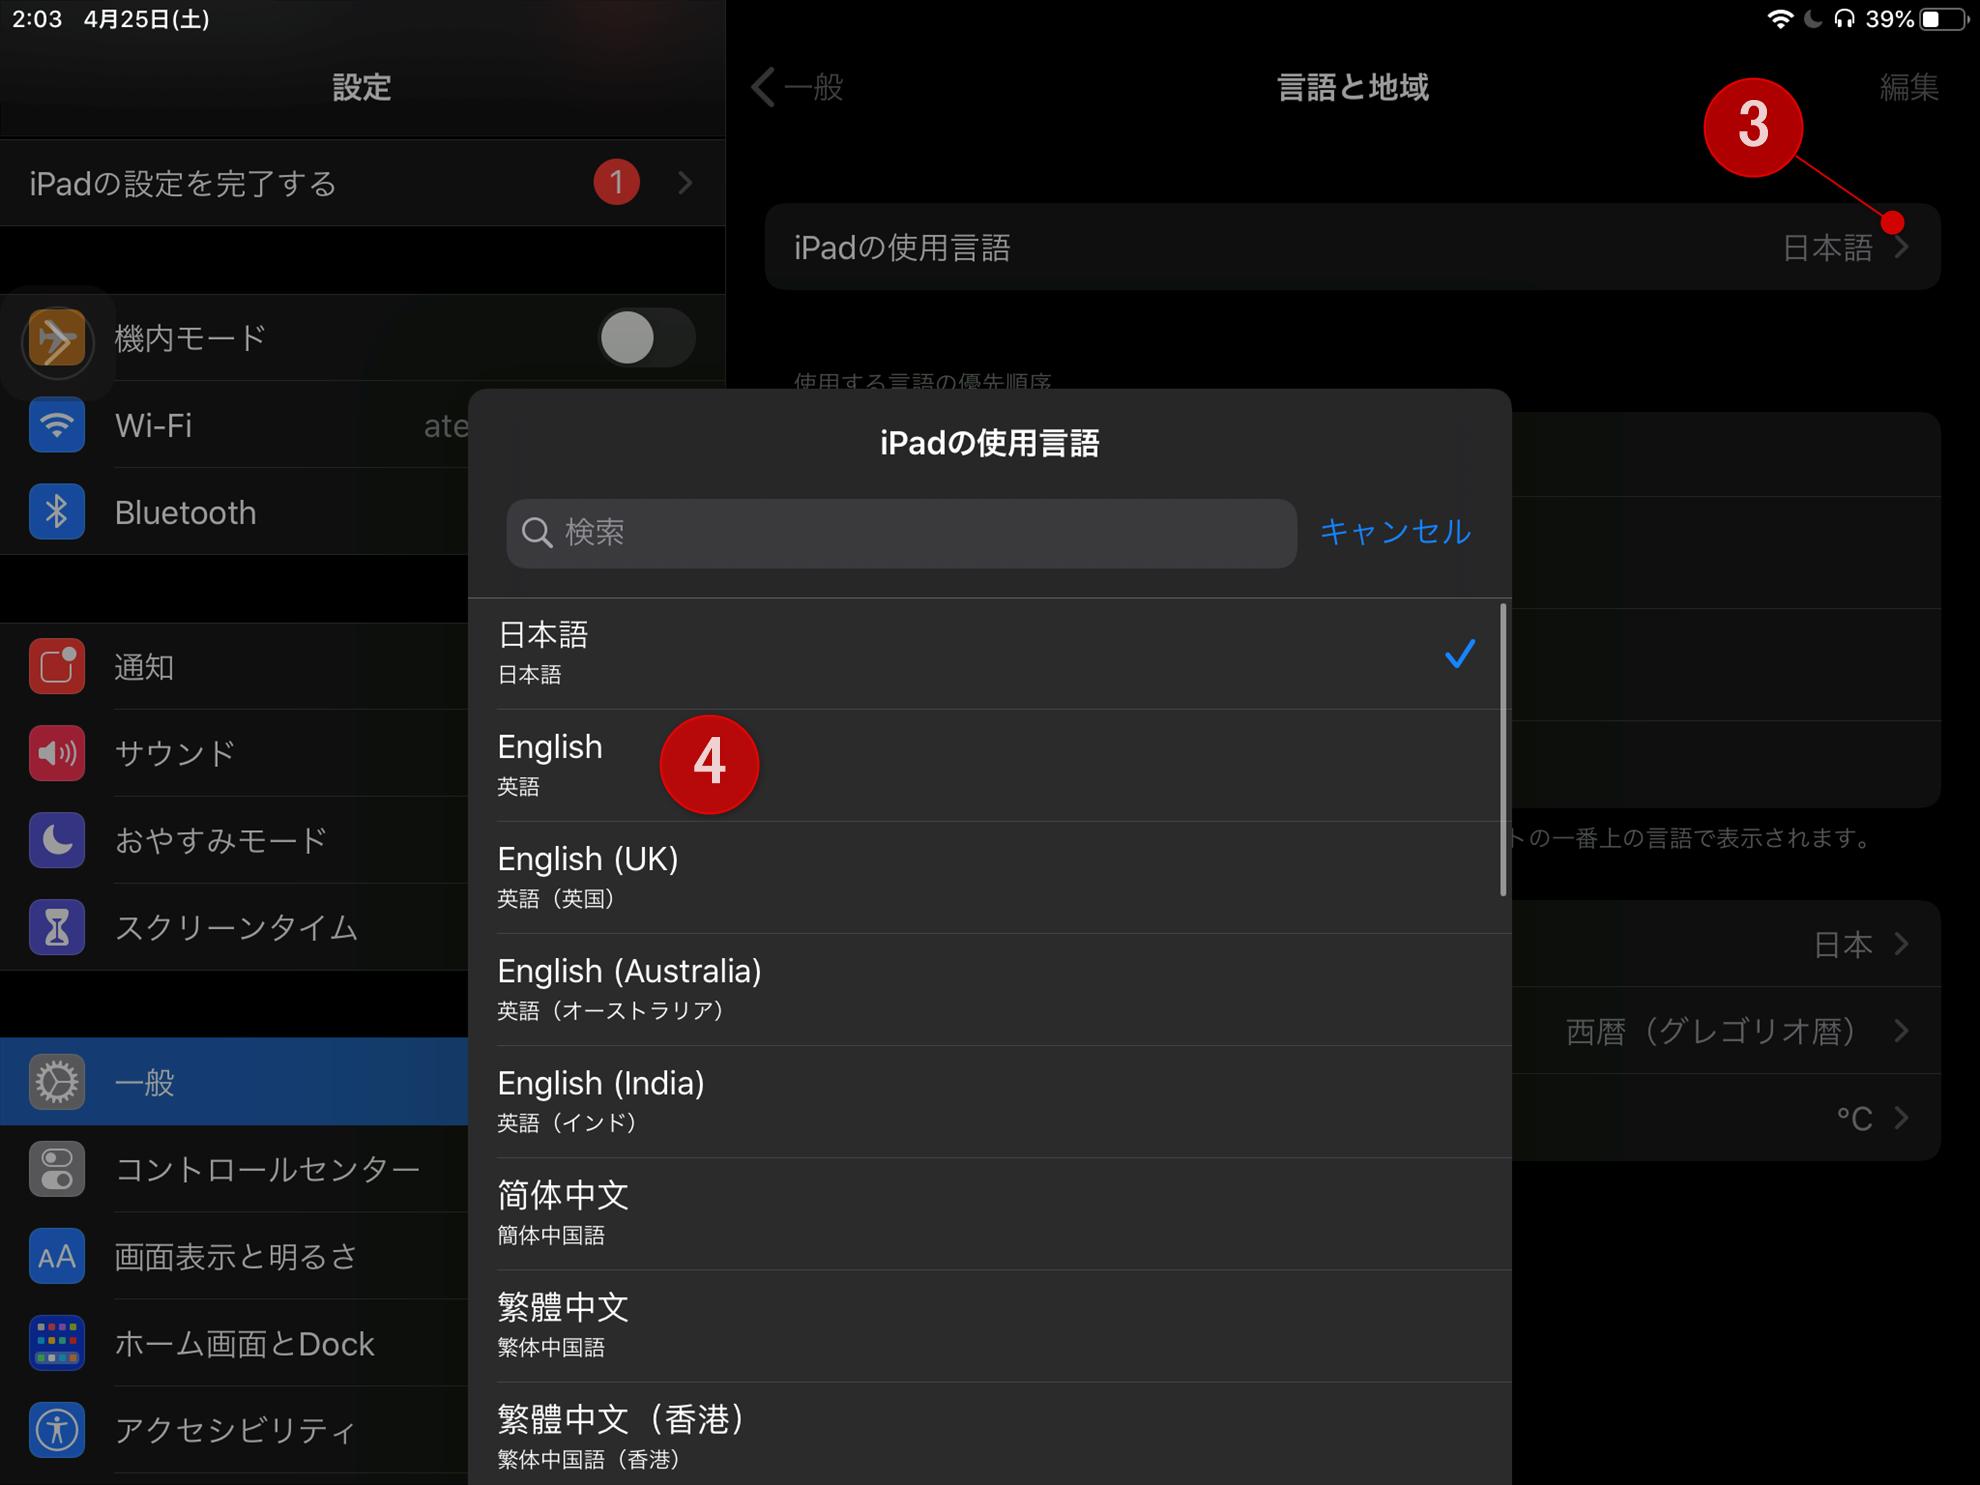 iPadの使用言語